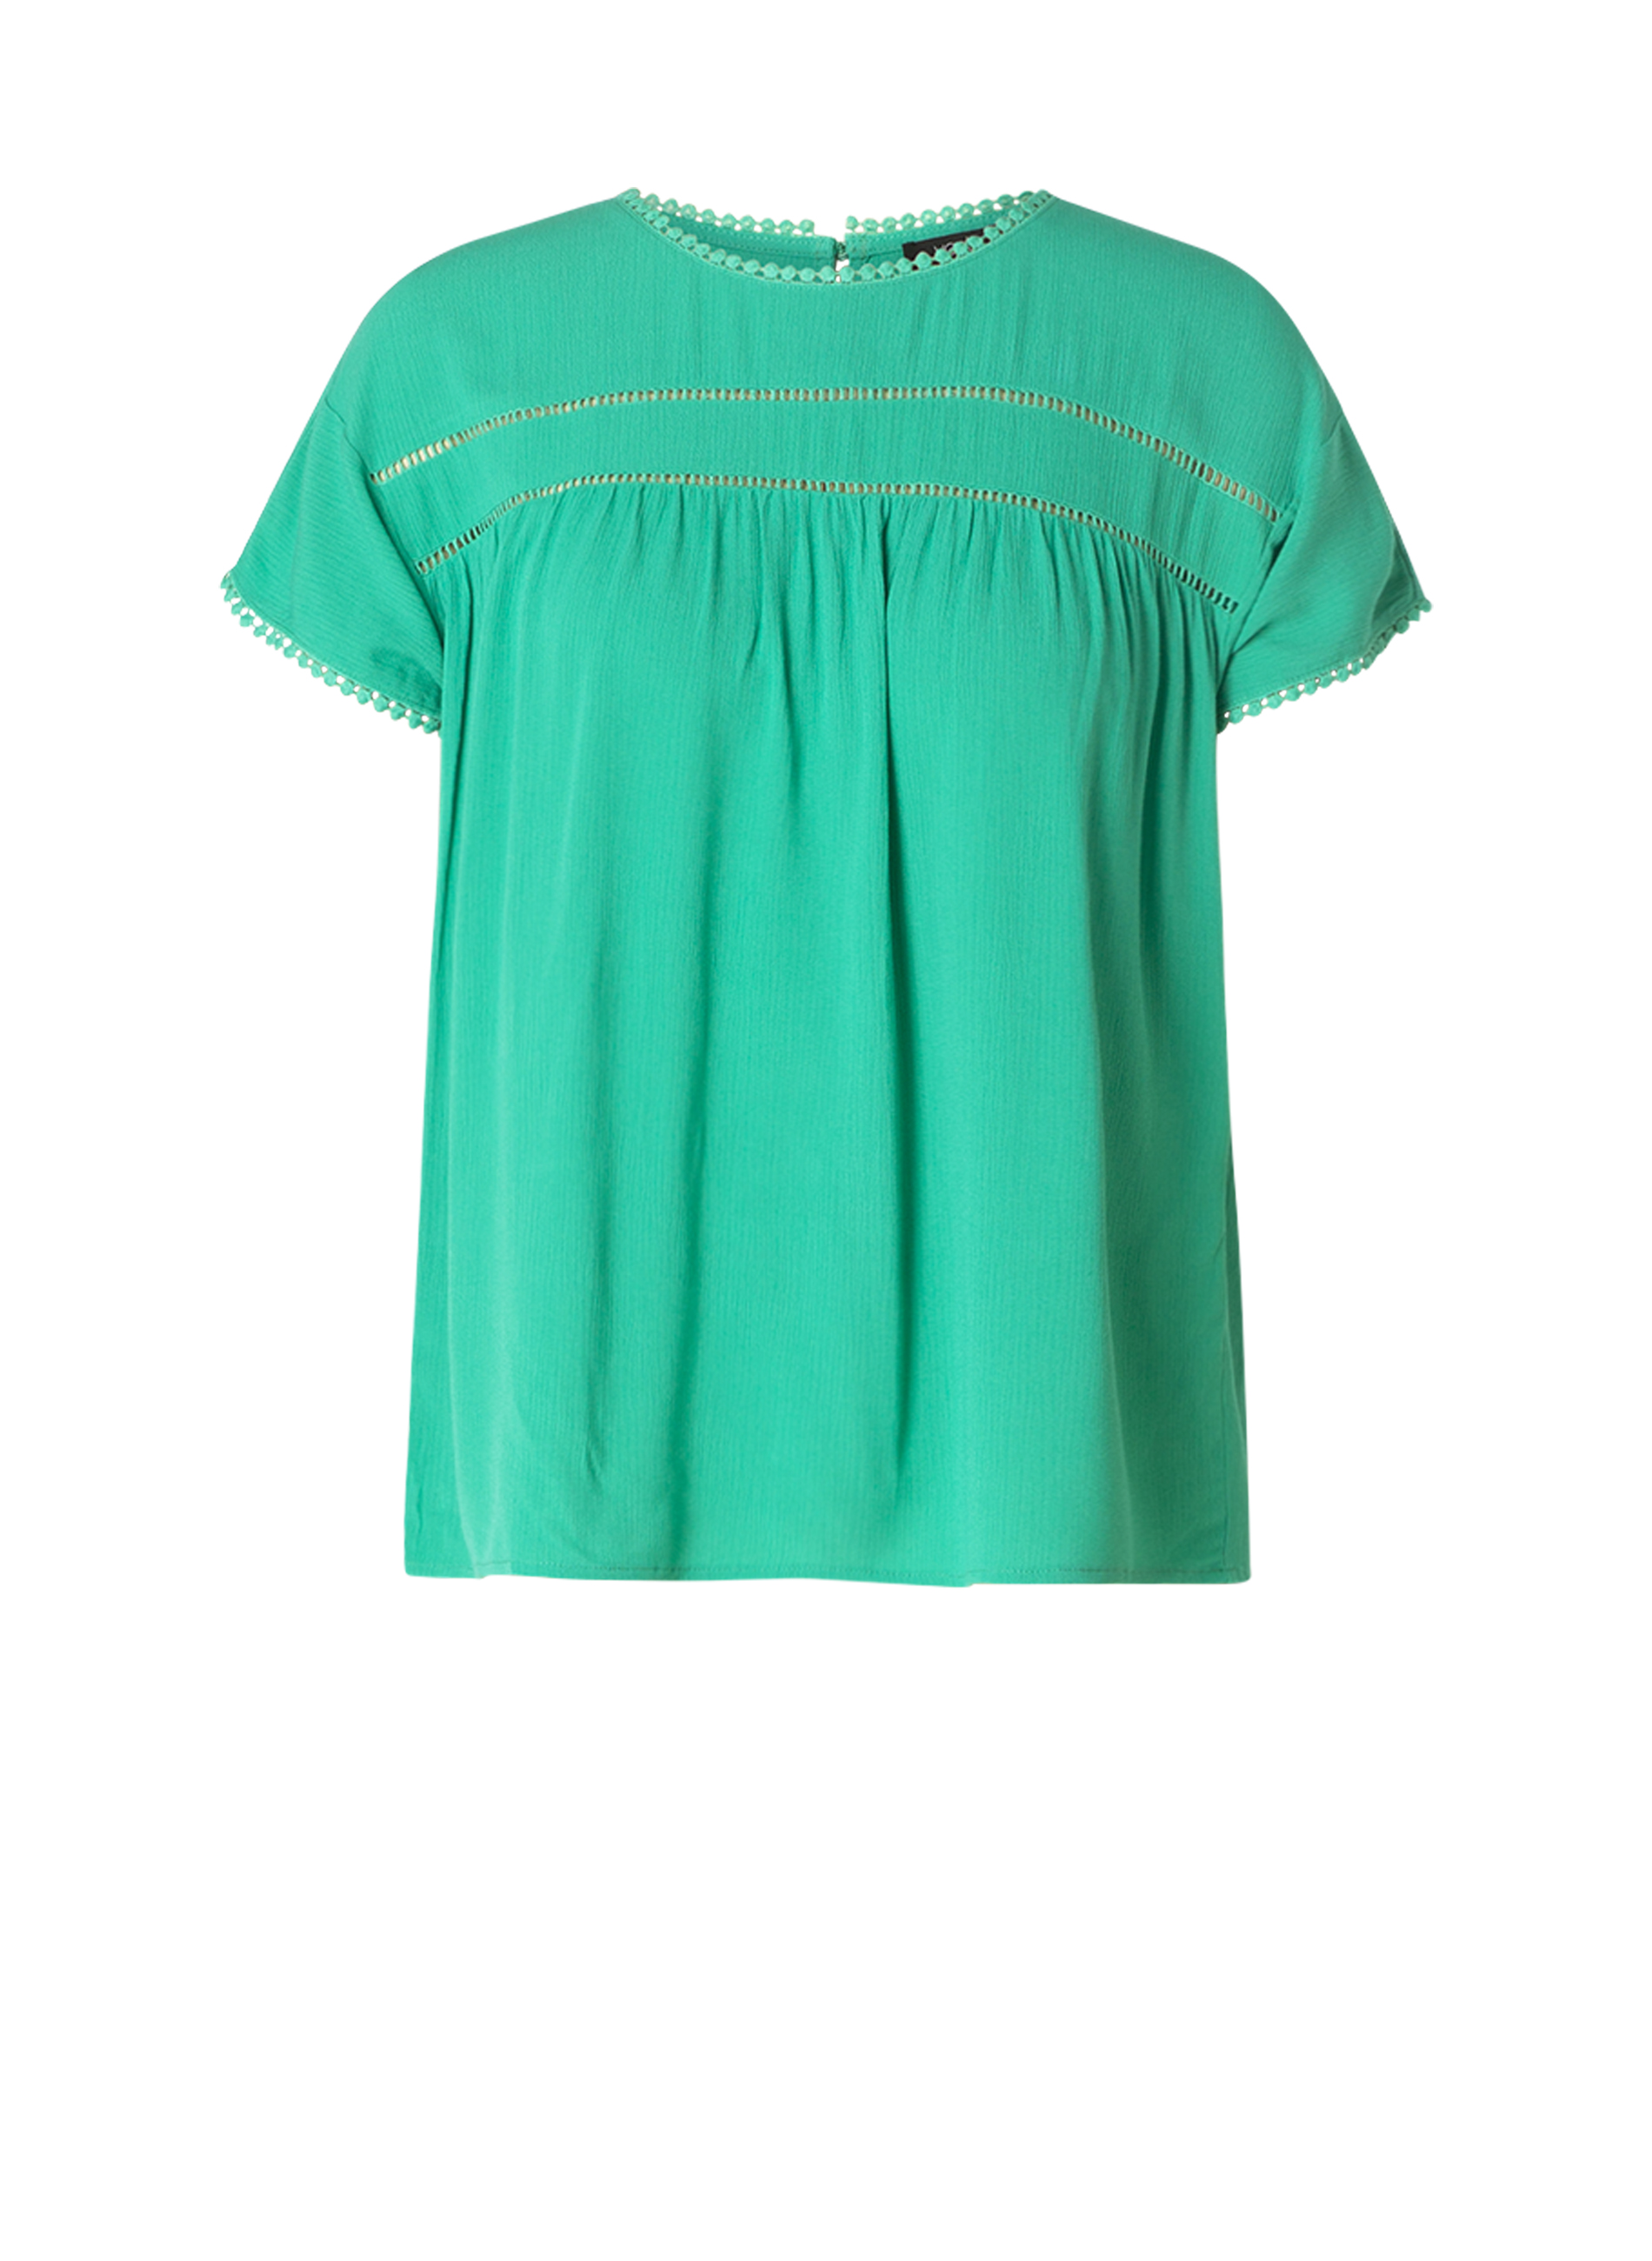 Yesta shirt Leeloo 76 cm